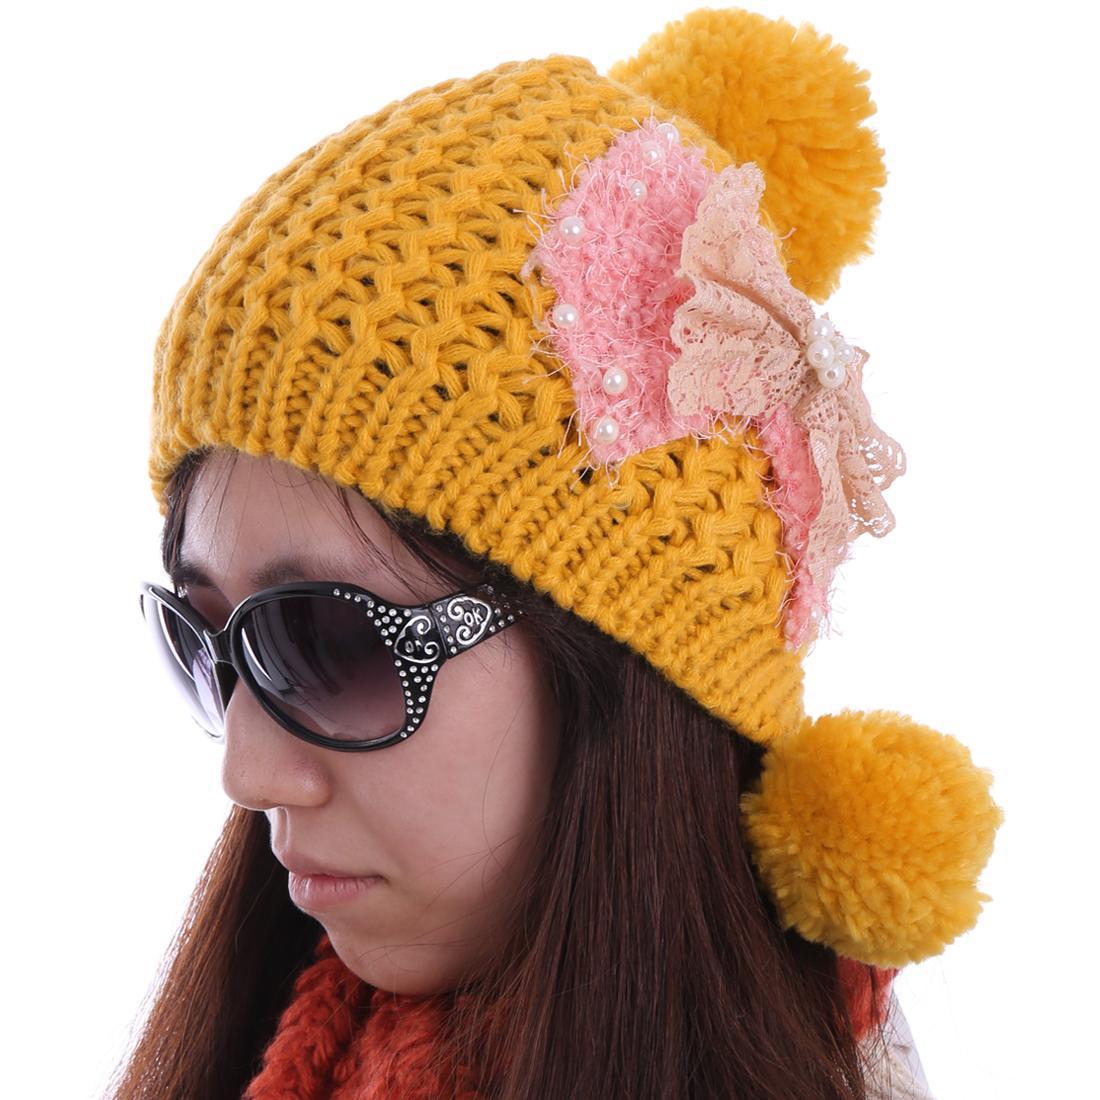 Women Beads Decor Pom Pom Kintting Wool Hat Yellow